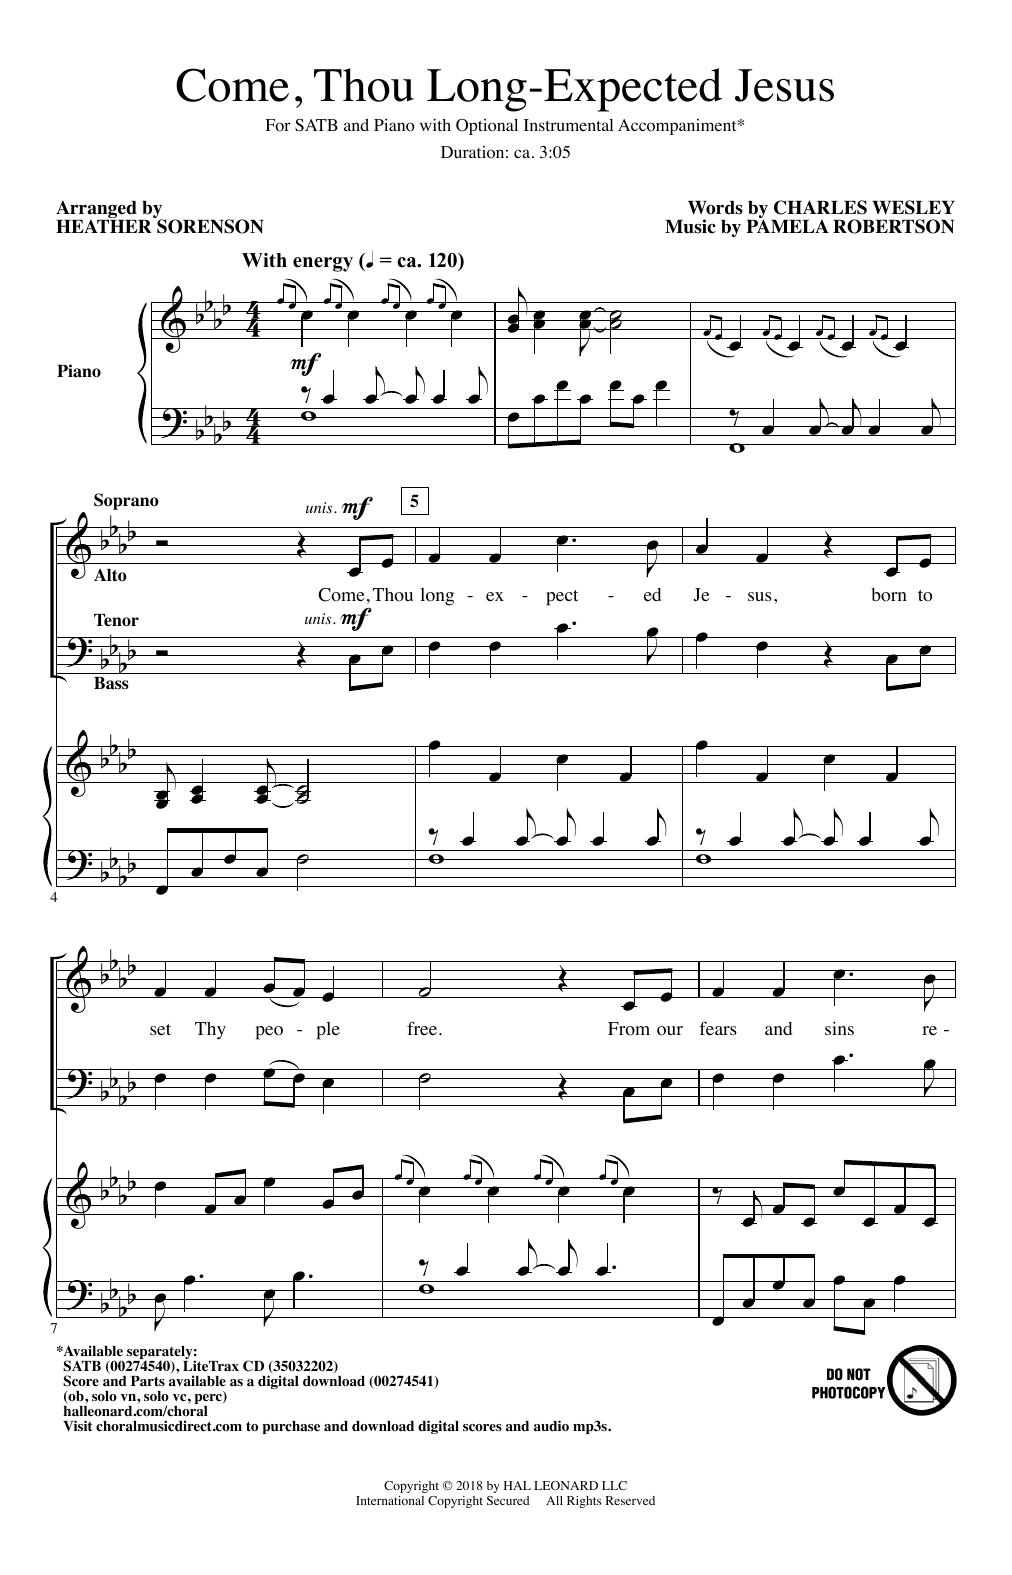 Sheet Music Digital Files To Print Licensed Heather Sorenson